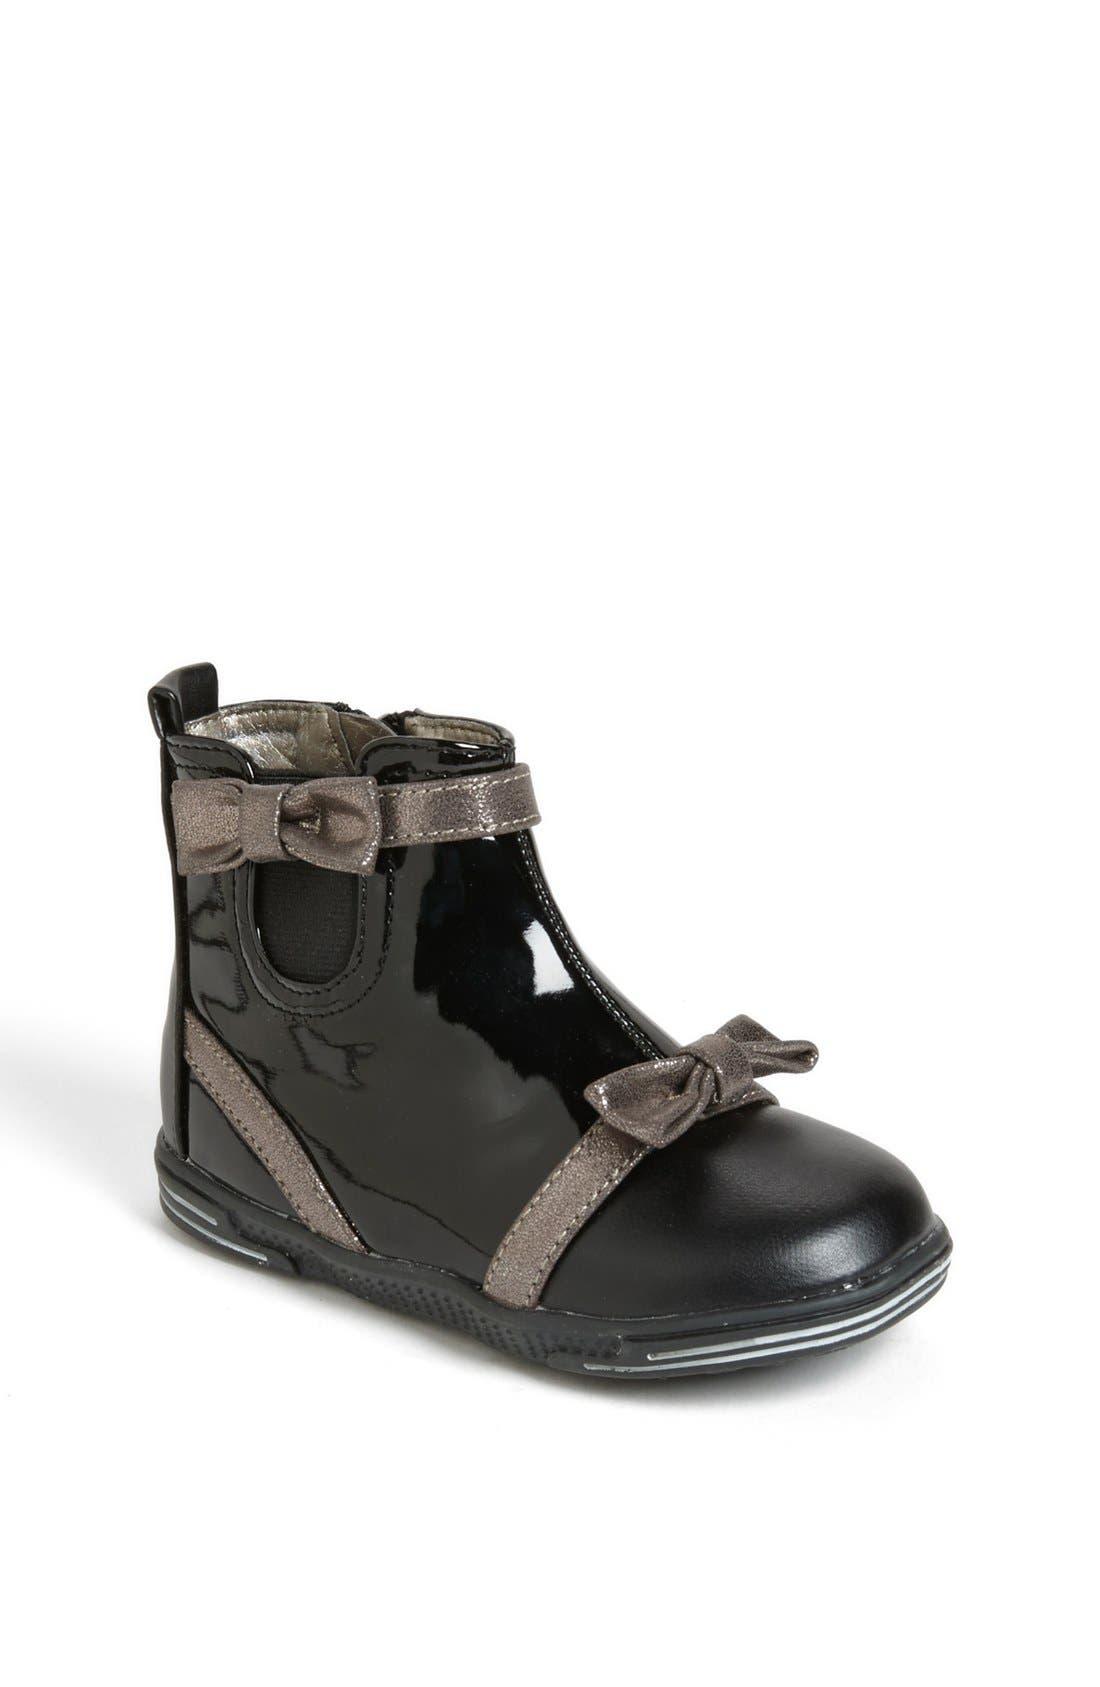 Main Image - kensie girl Bow Boot (Walker & Toddler)